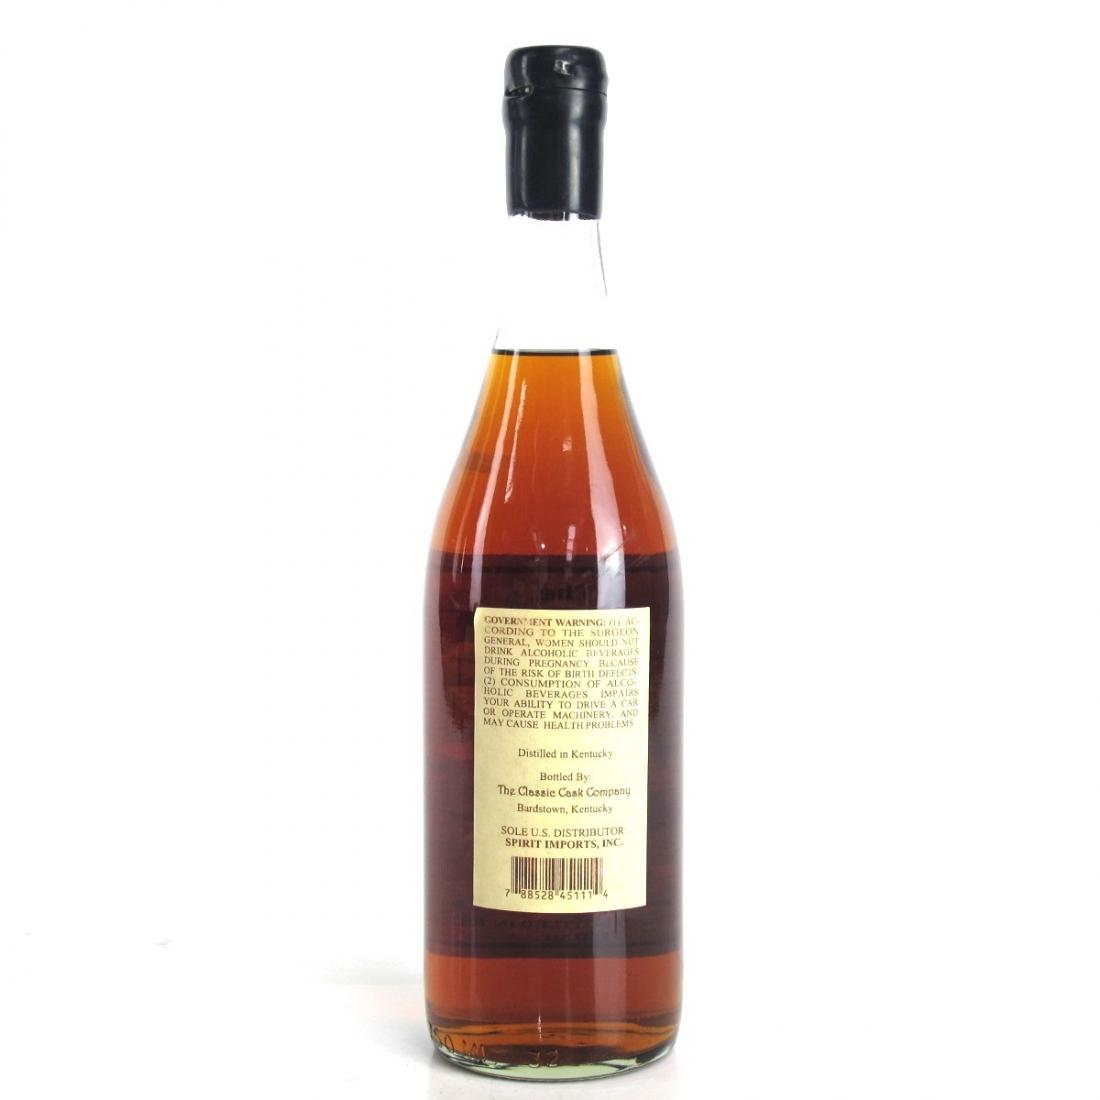 Classic Cask 1989 Single Batch 15 Year Old Kentucky Bourbon